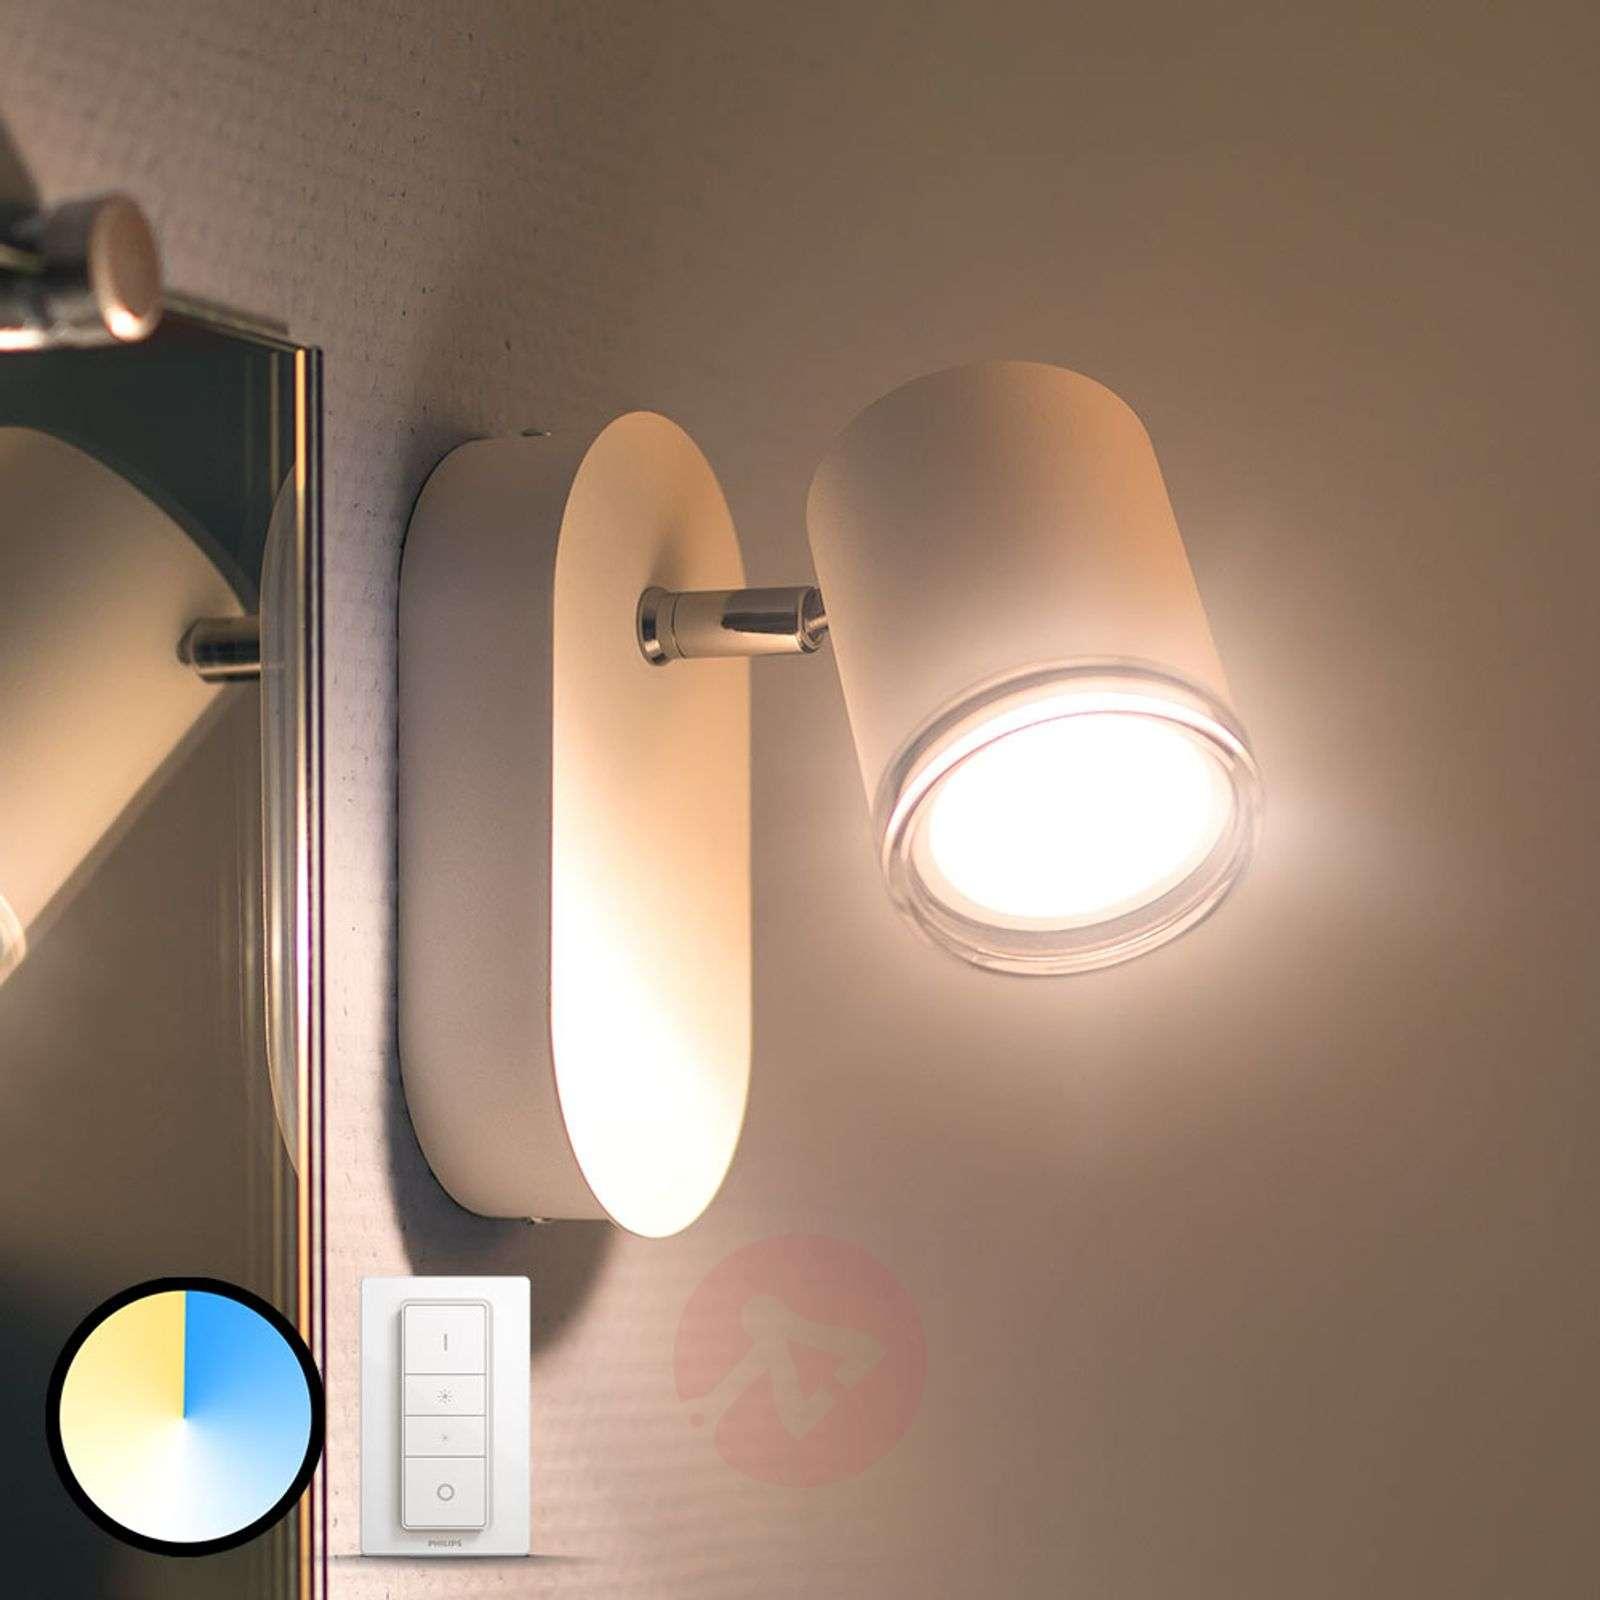 Philips Hue White Ambiance Adore LED-spottivalo-7534071-01